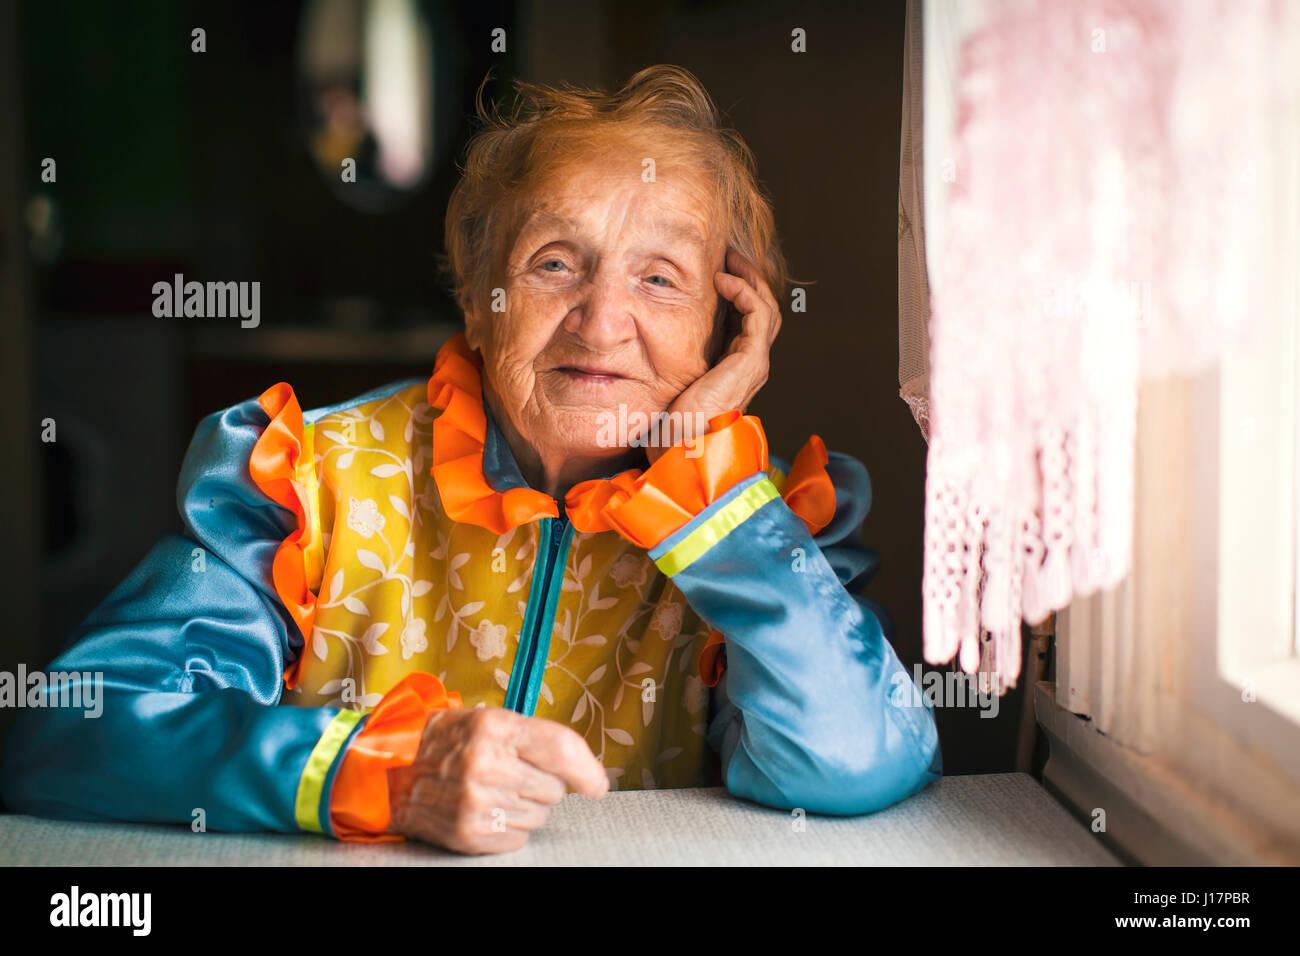 An elderly woman in Slavic ethnic clothing. - Stock Image